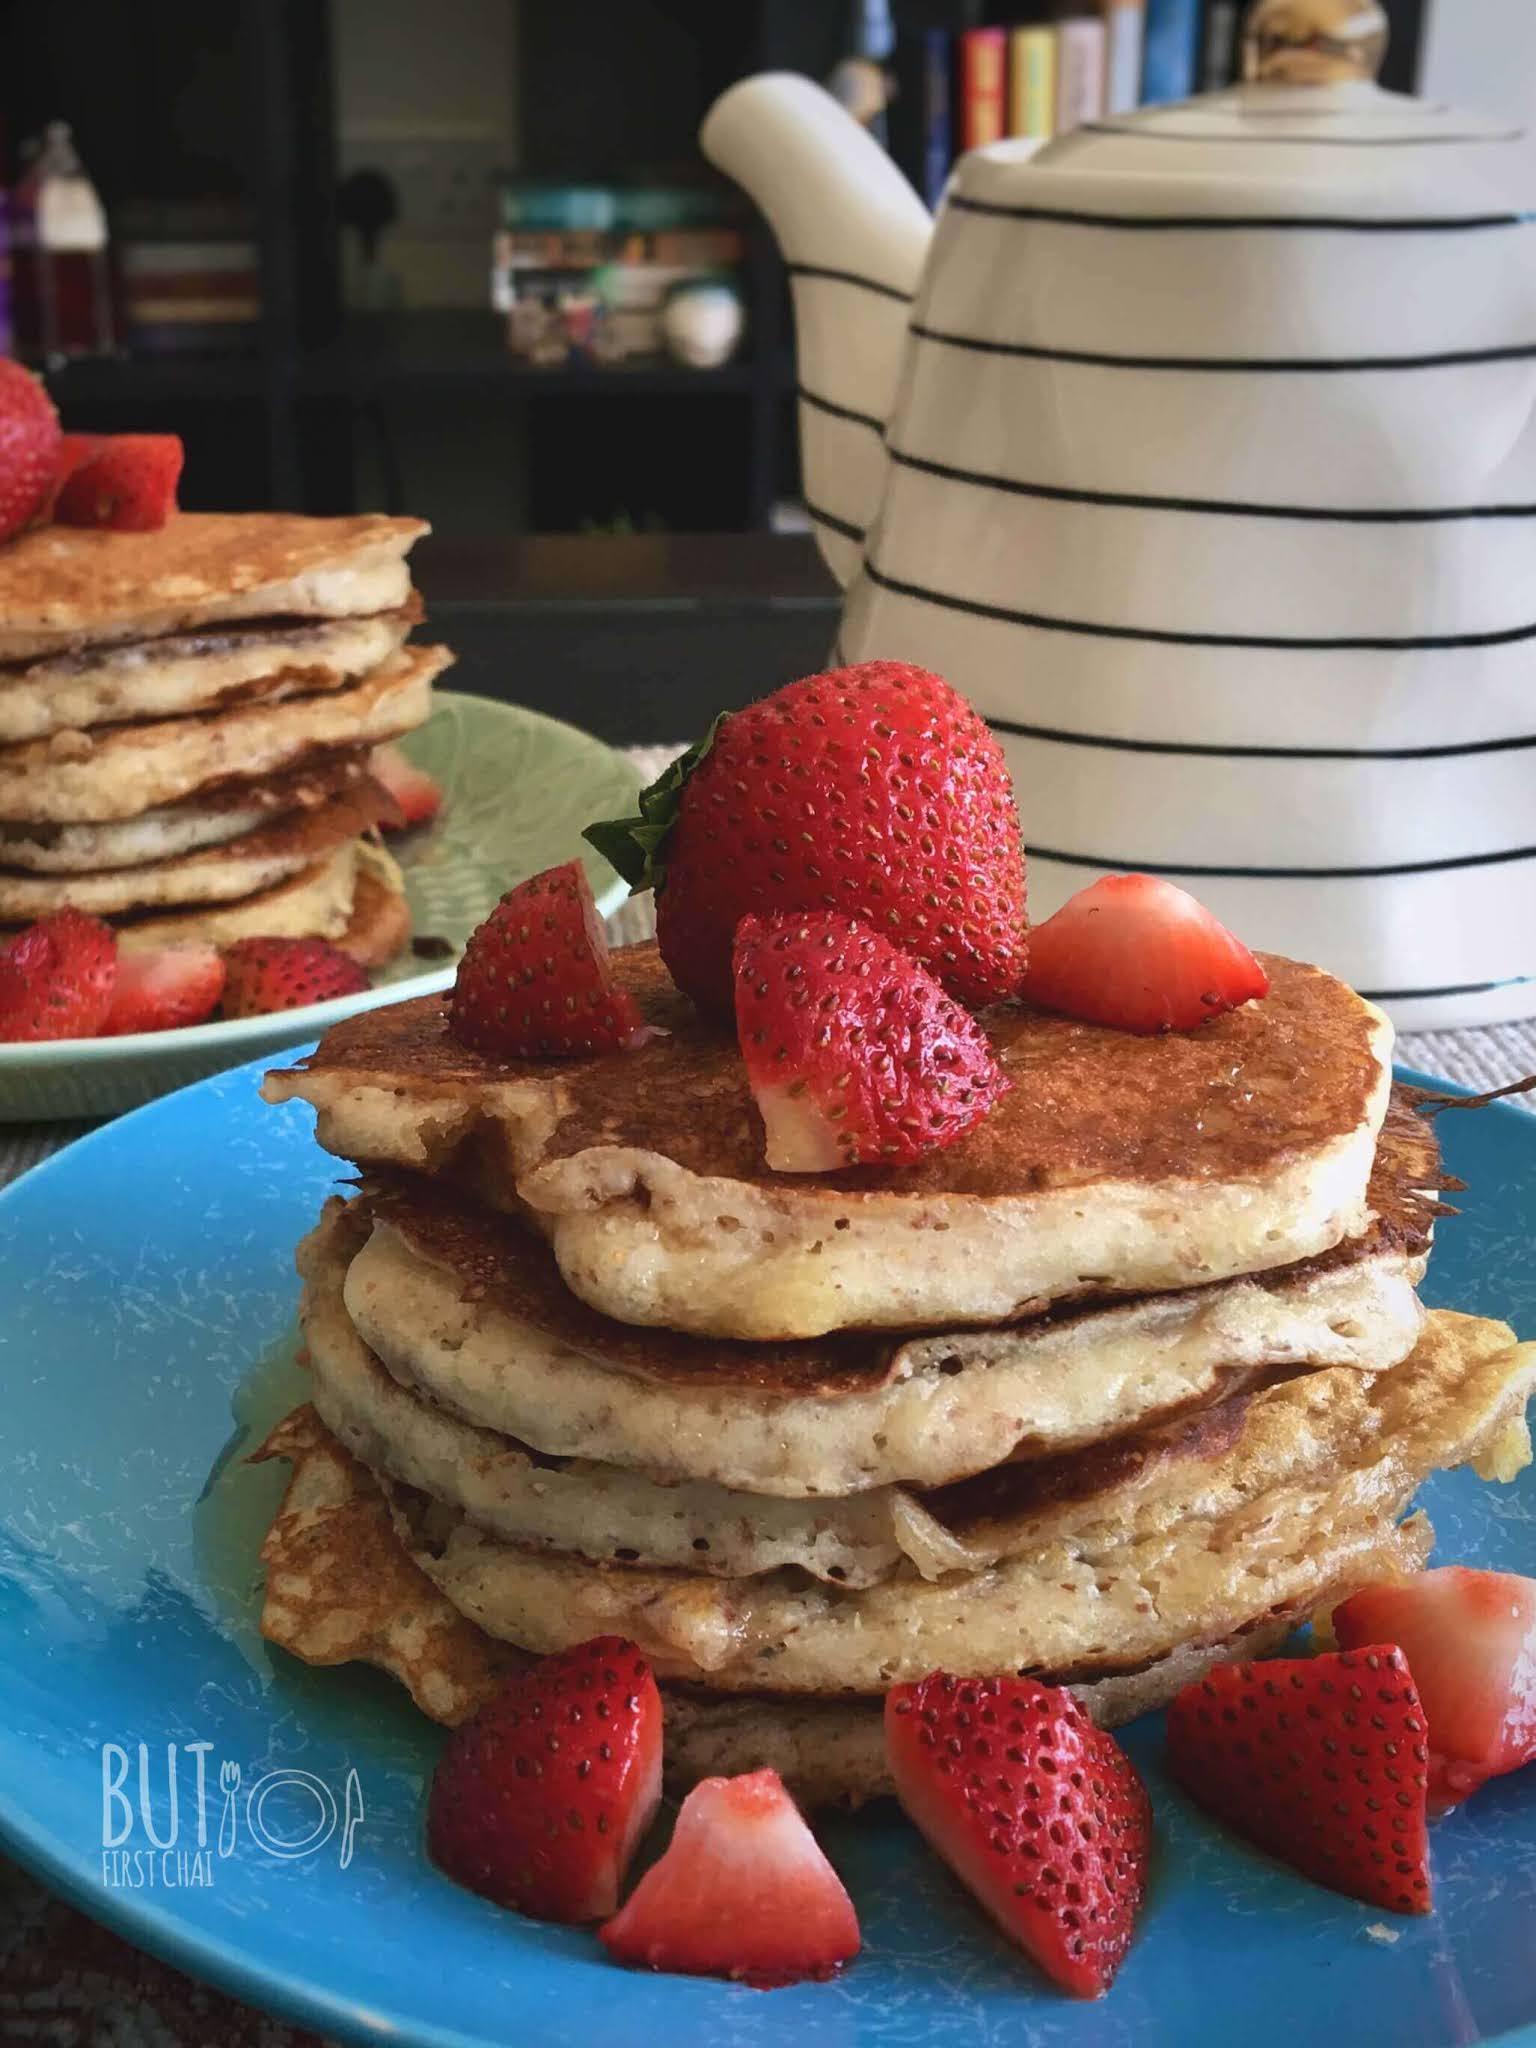 My Best Buttermilk Pancakes